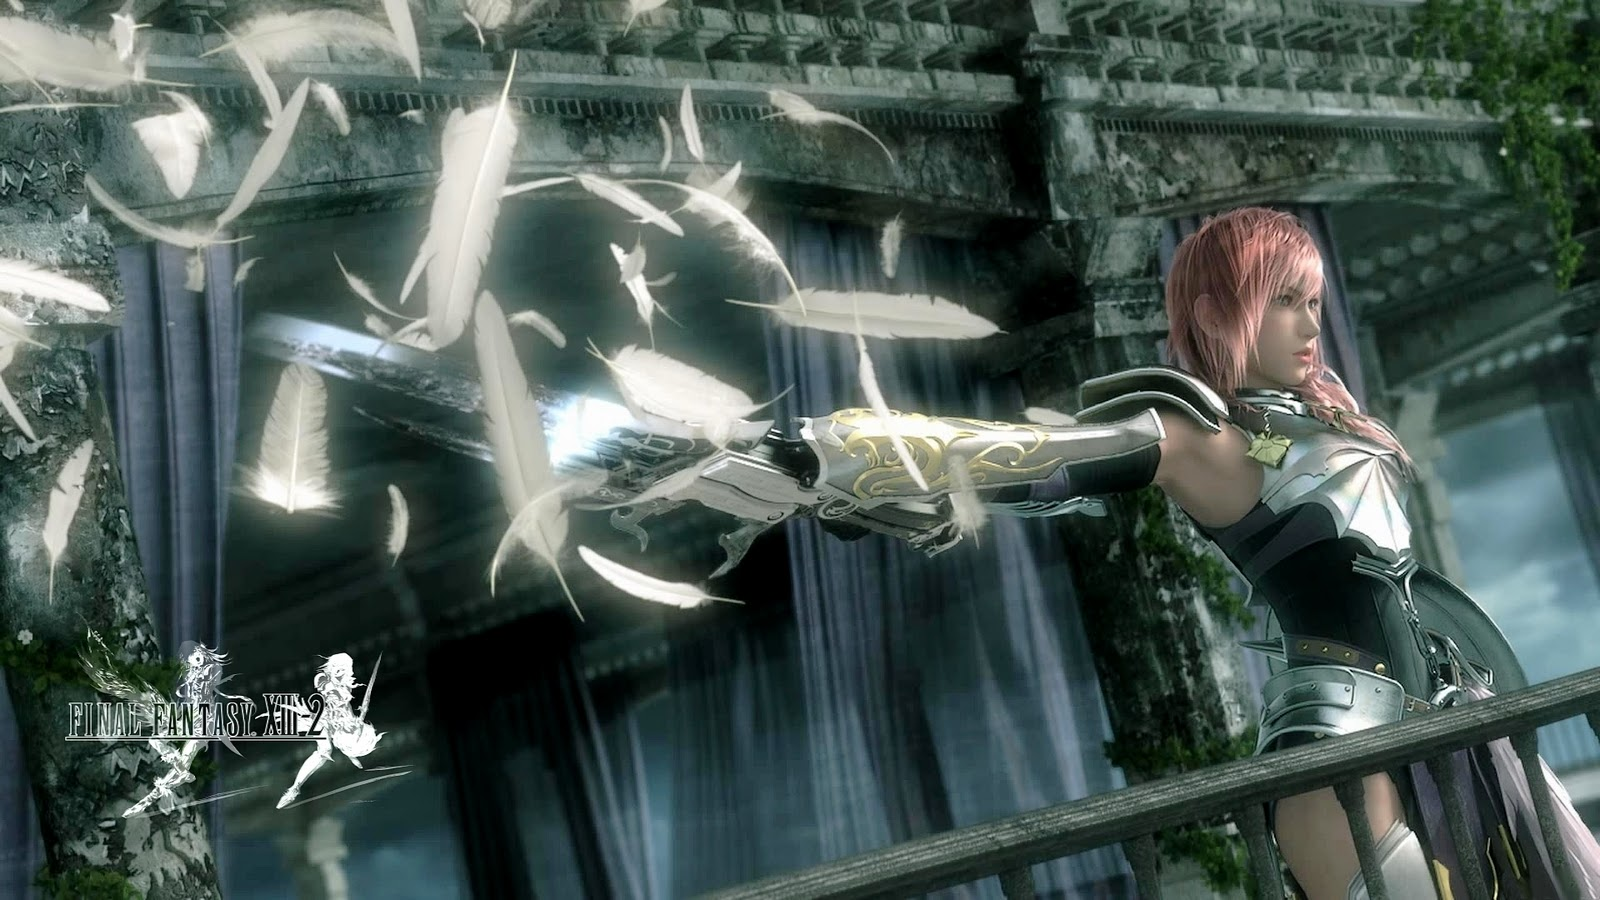 Final Fantasy Xiii Wallpaper: THE BING: Final Fantasy XIII-2 Game Wallpaper